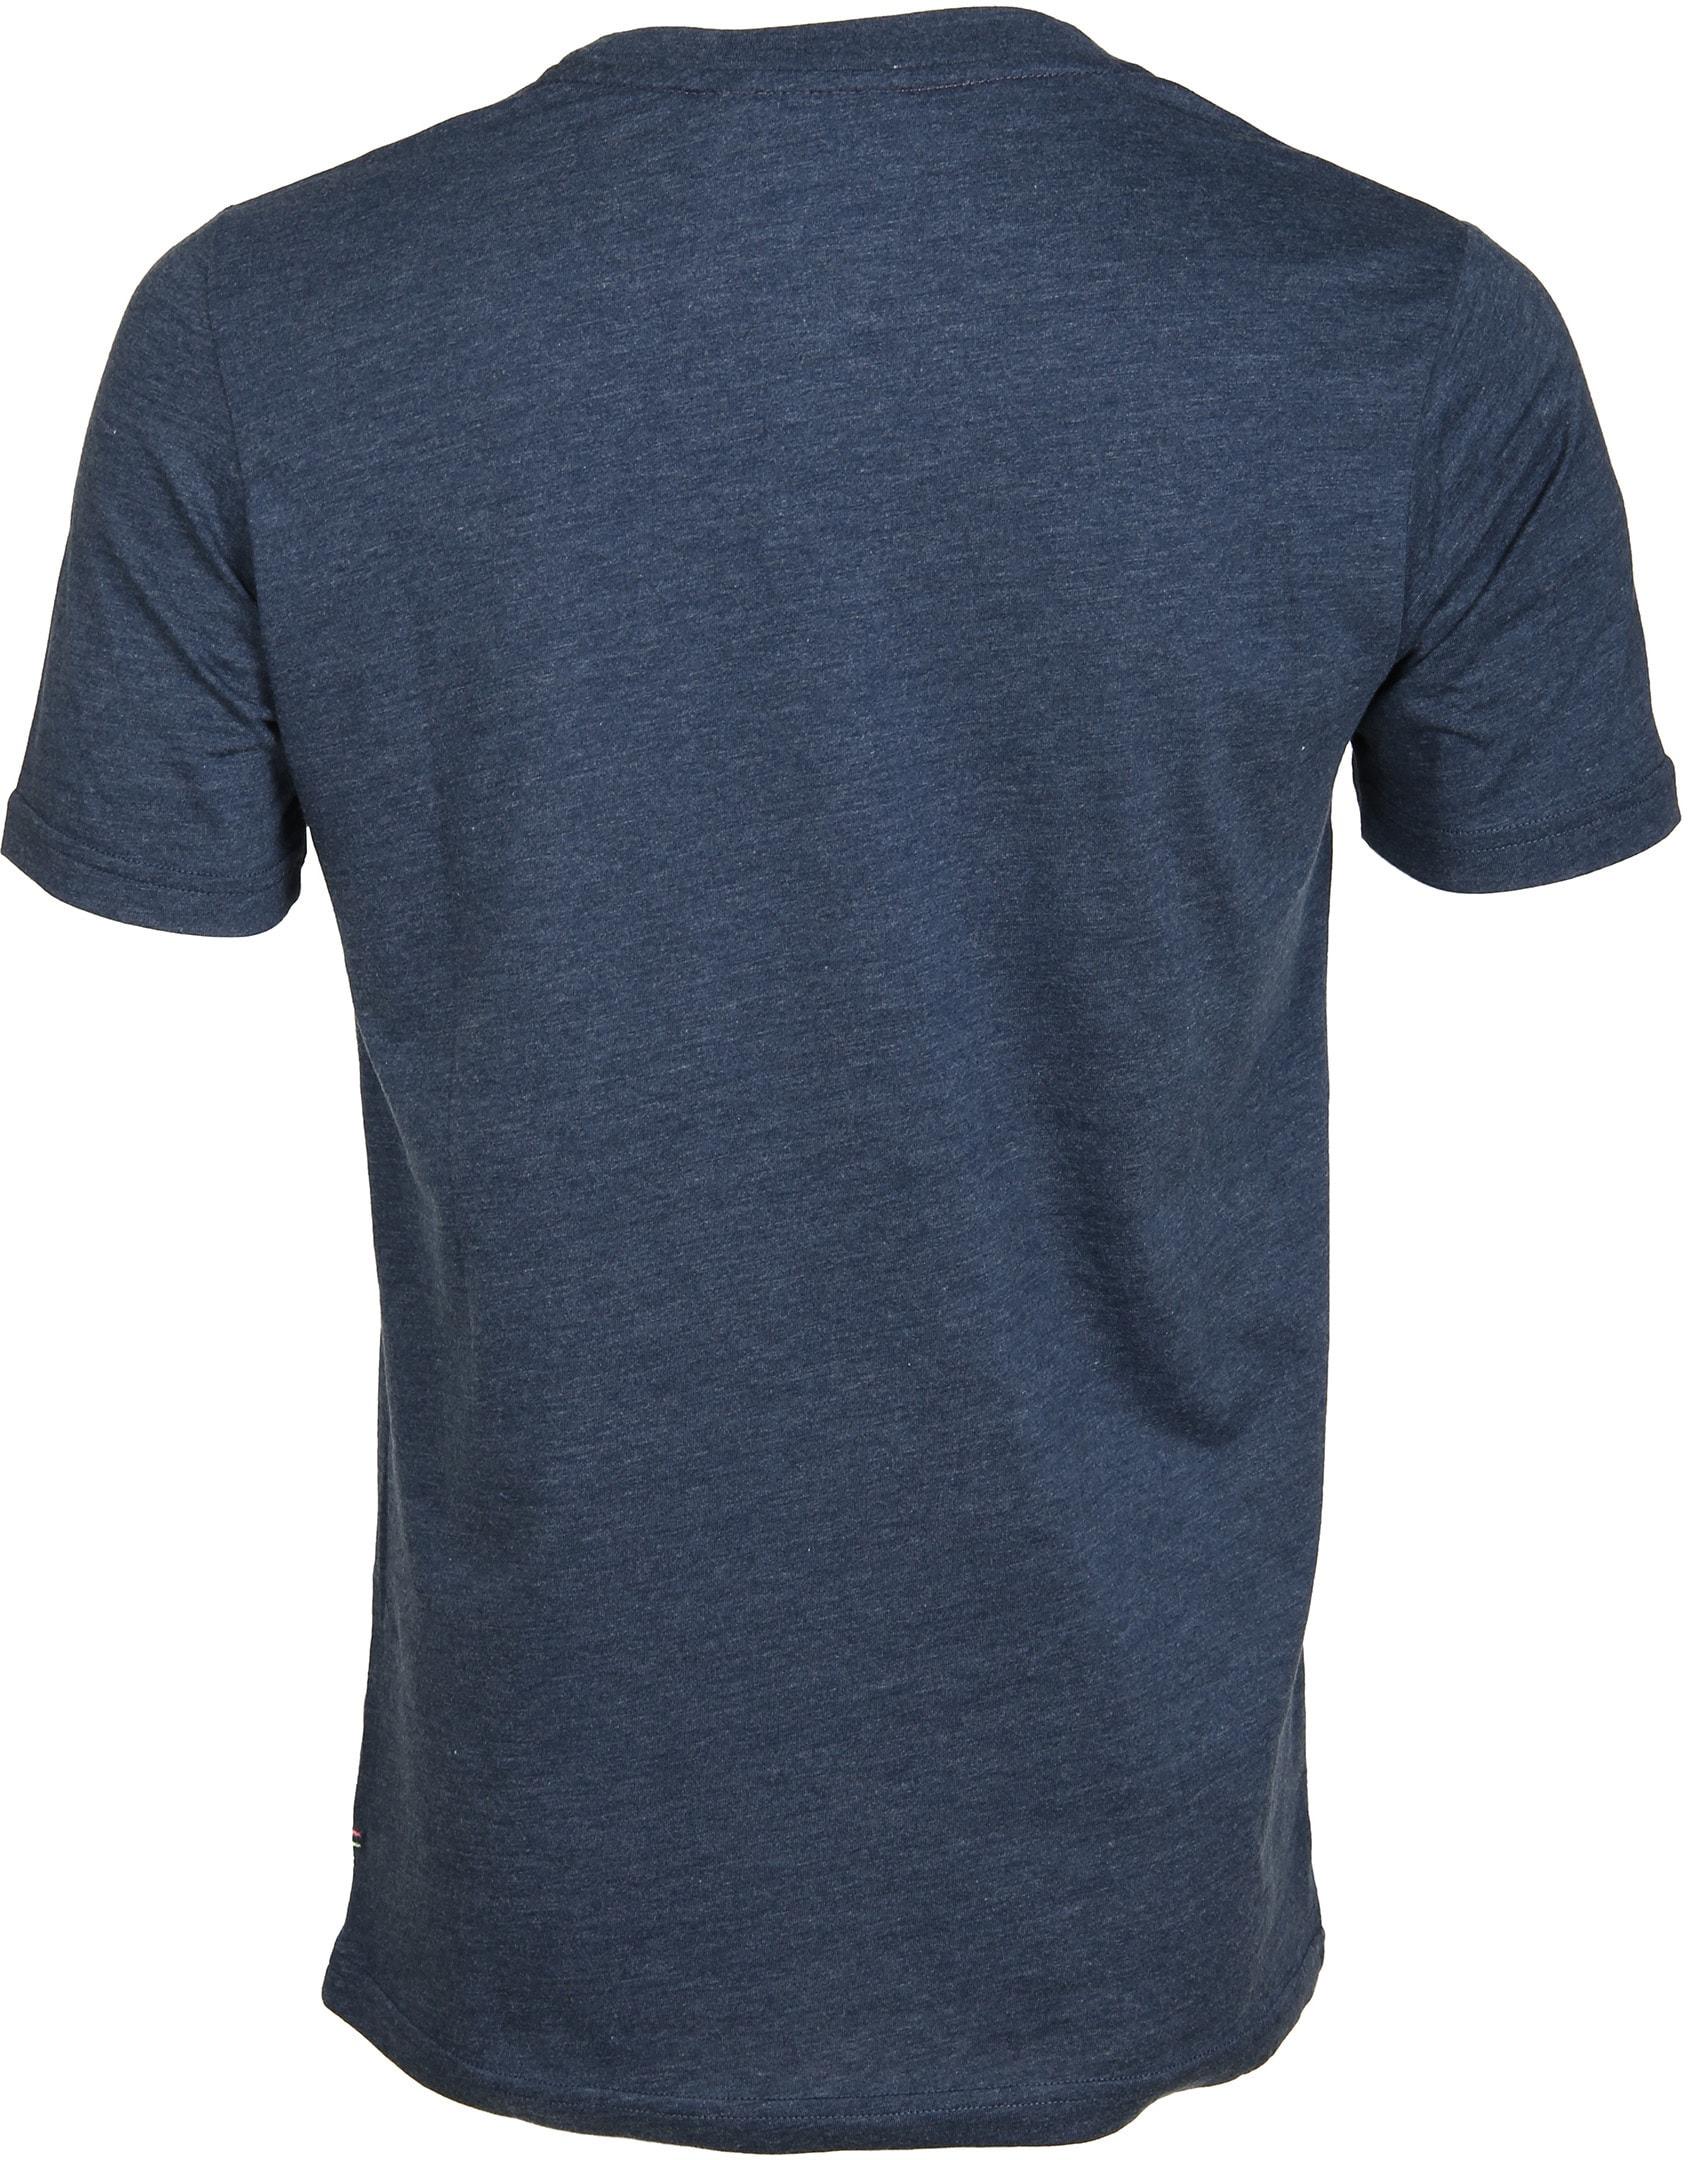 NZA Dampier T-shirt Navy foto 2